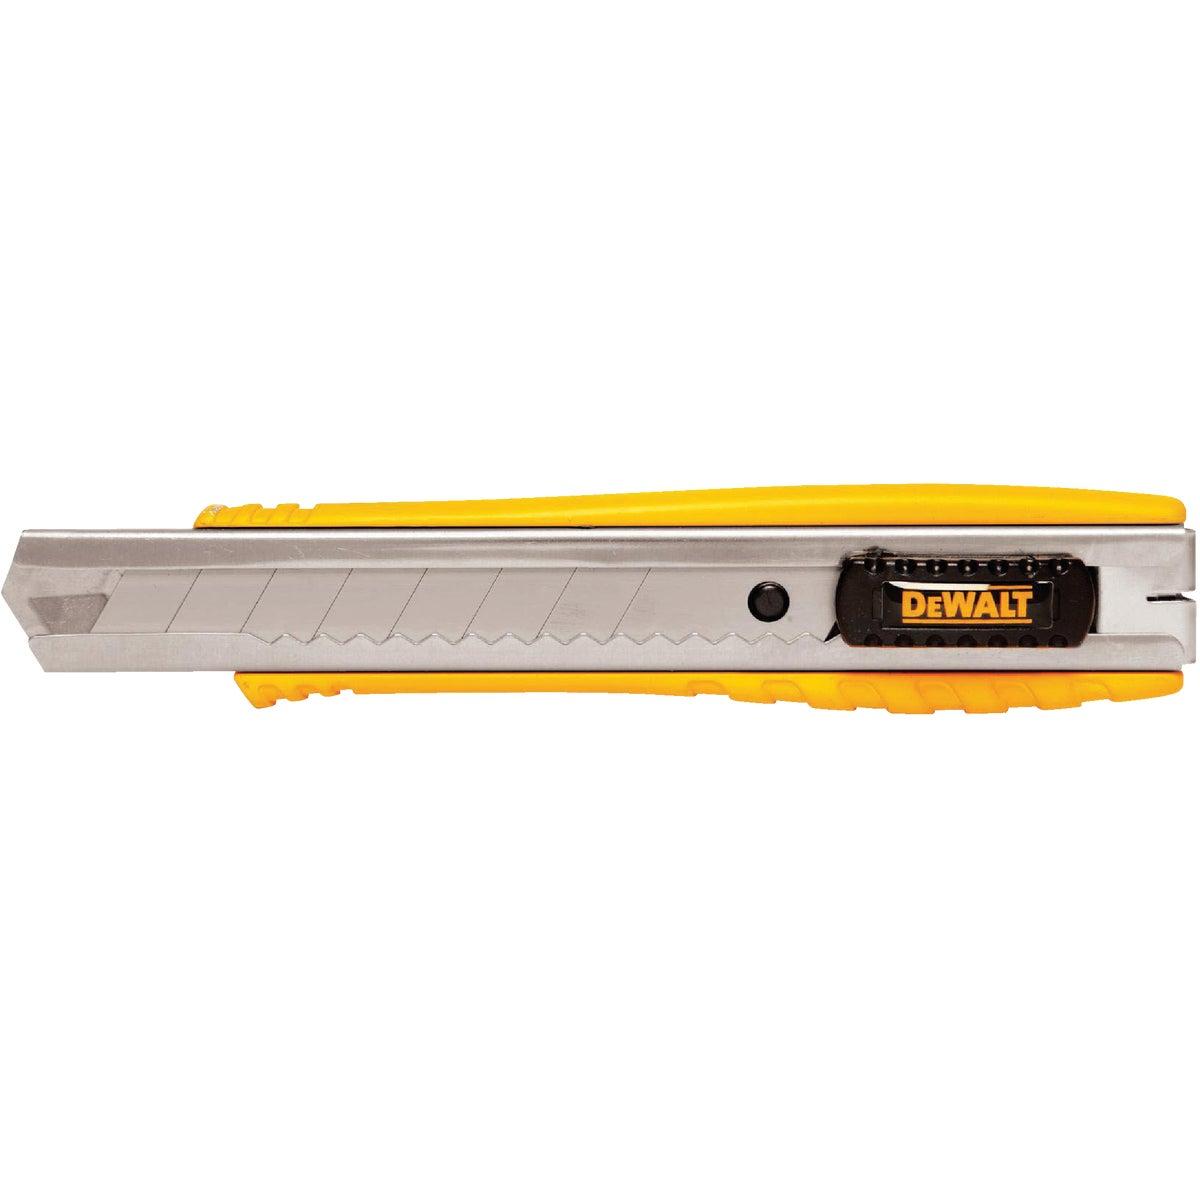 DEWALT 18MM SNAP KNIFE - DWHT10038 by Stanley Tools